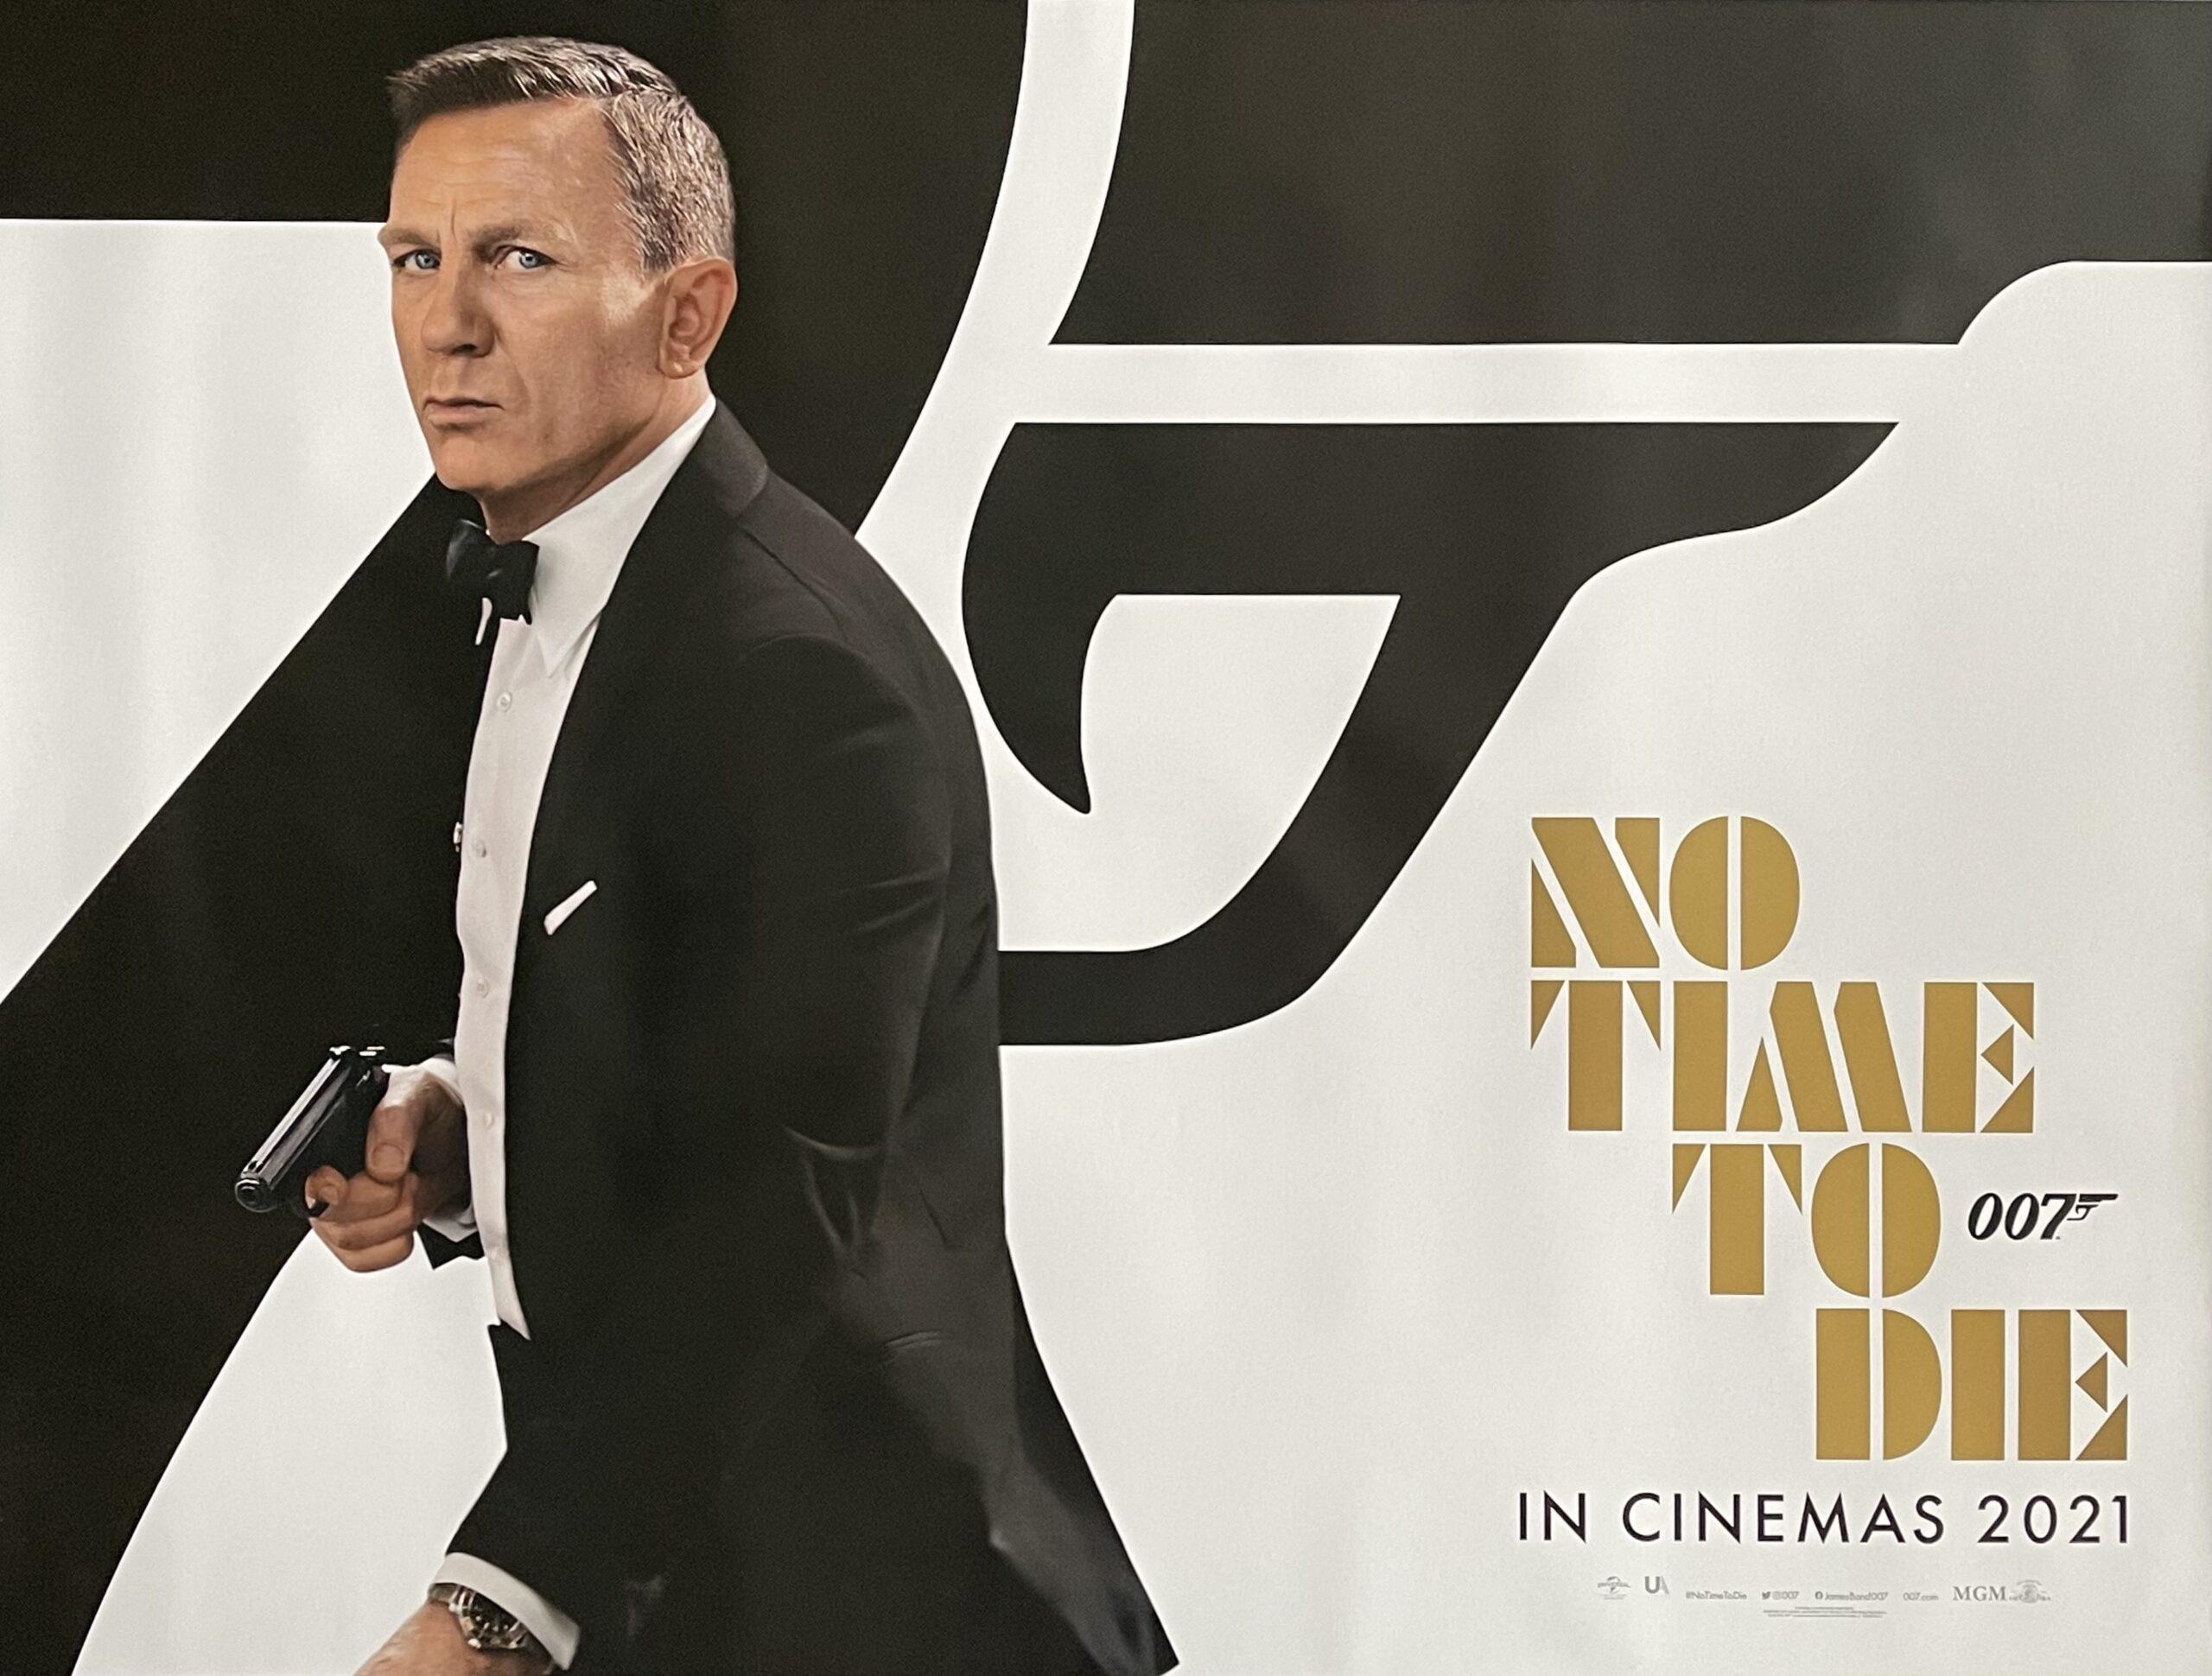 Original James Bond No Time To Die Movie Poster - 007 - Daniel Craig